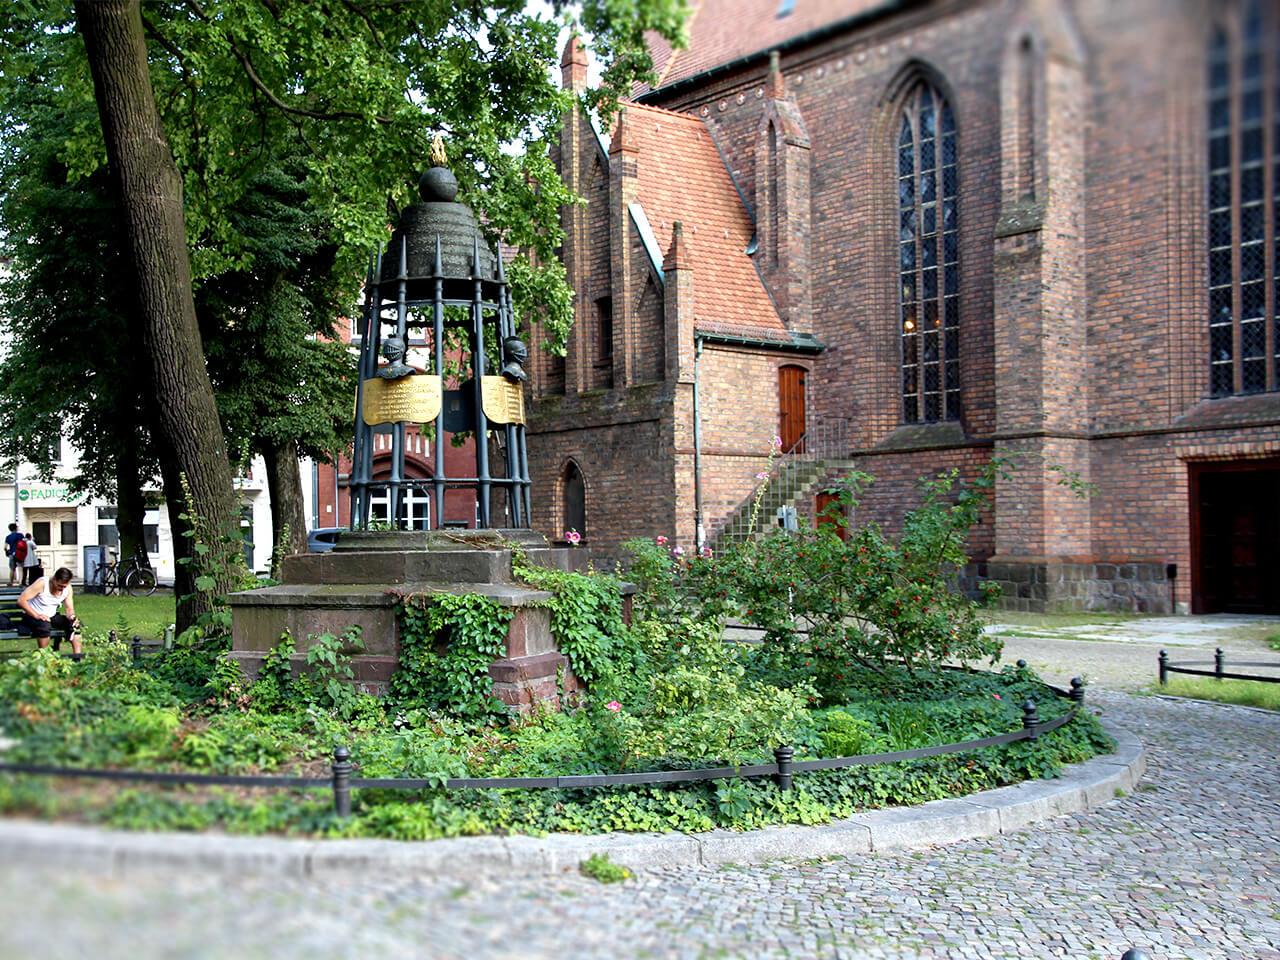 Reformationsplatz